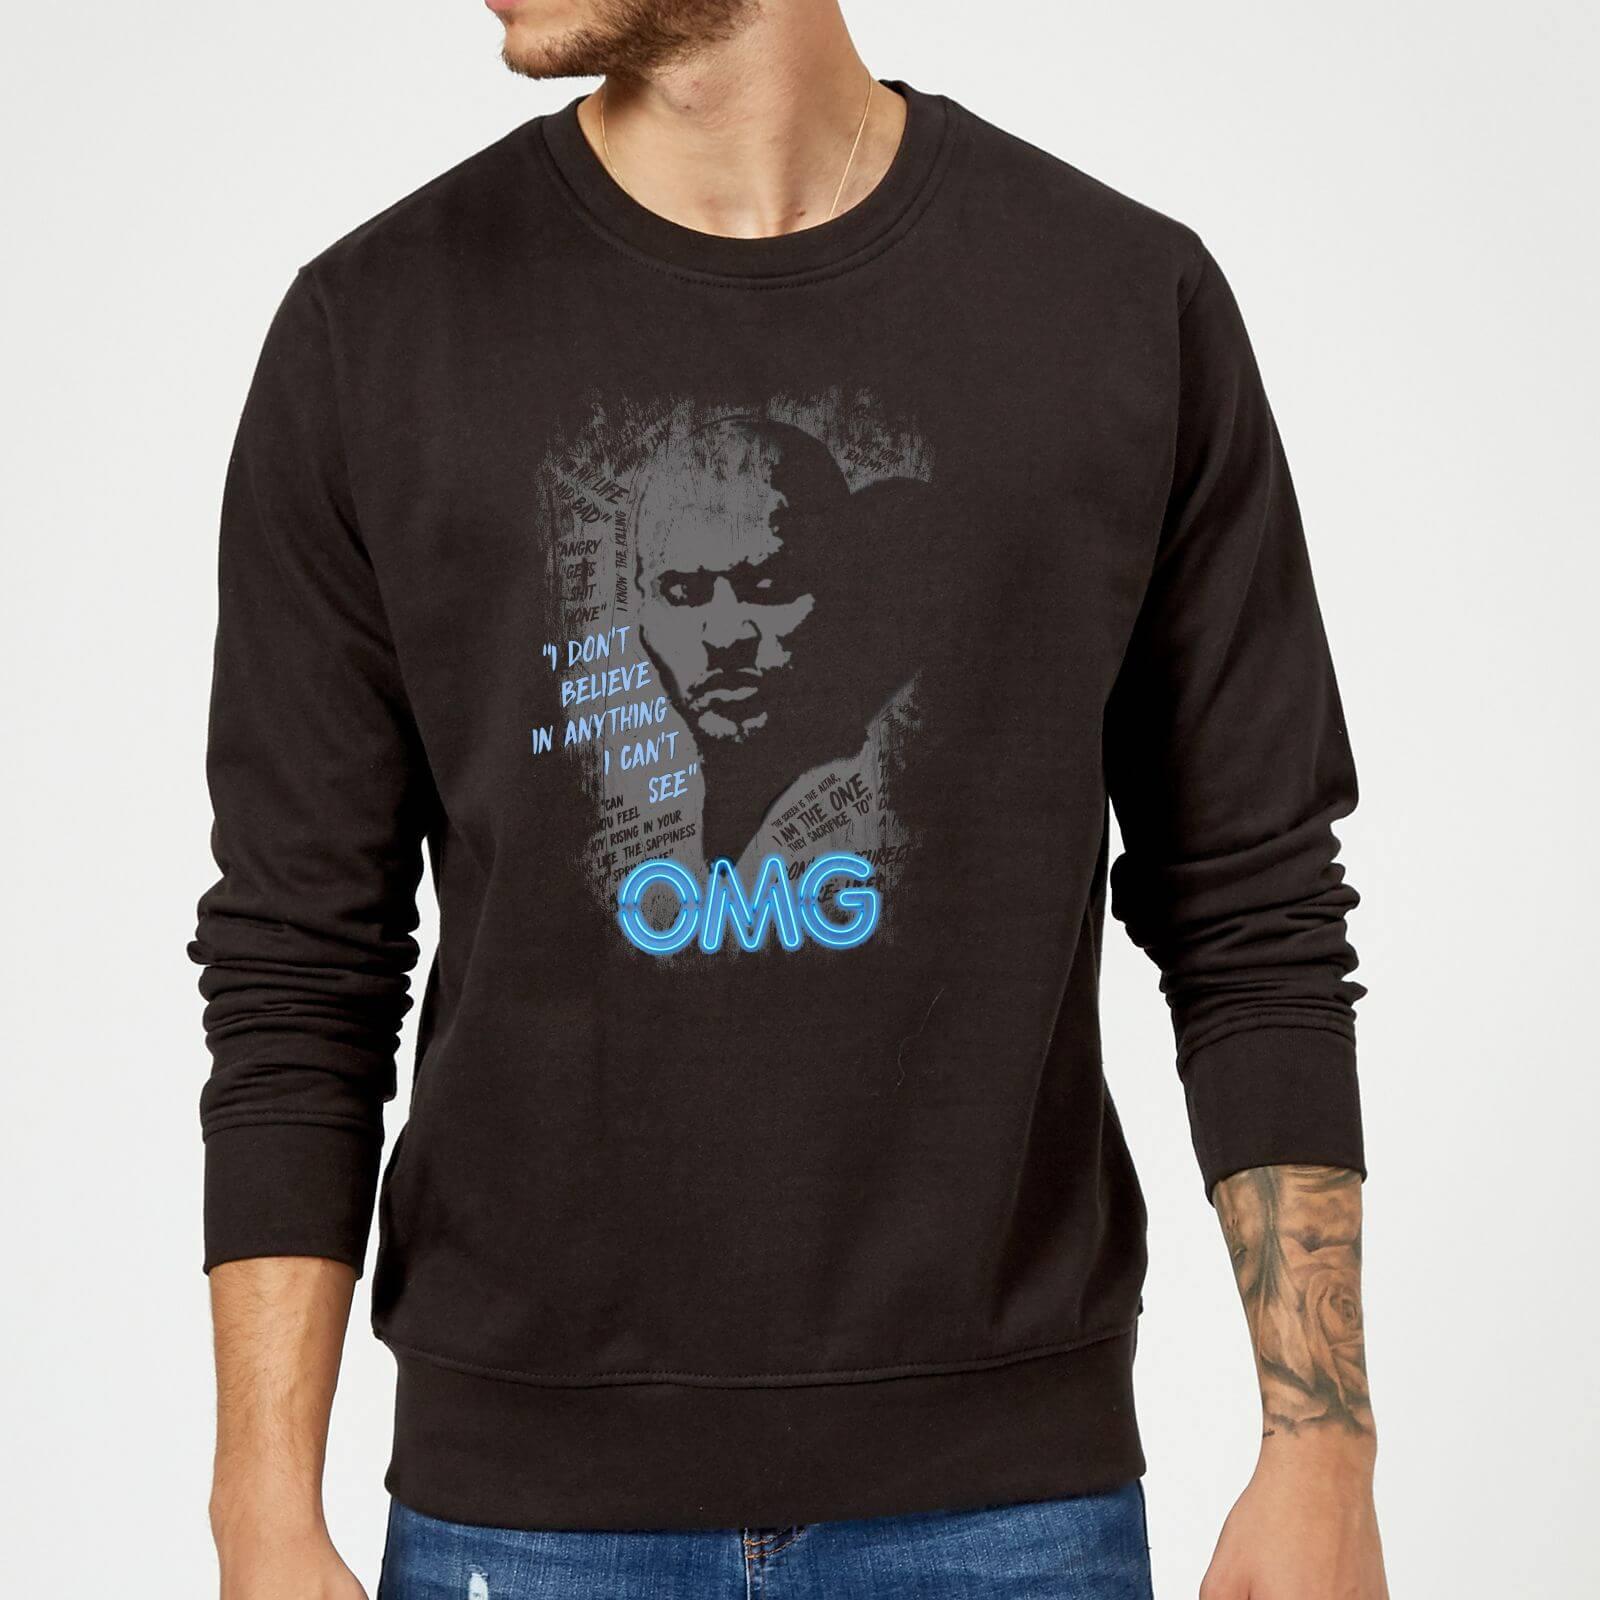 American Gods Shadow OMG Sweatshirt - Black - L - Black-male